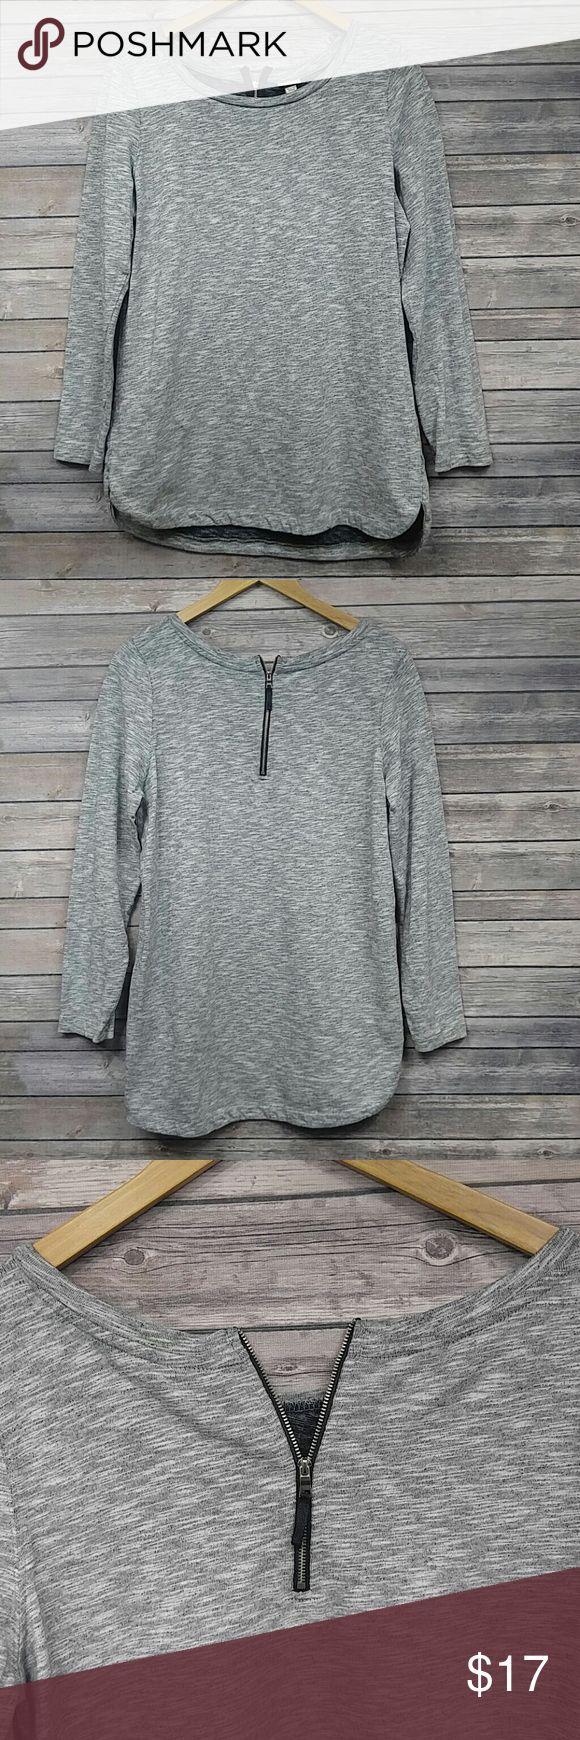 Merona grey long sleeve dress ?100% cotton ?Size XL ?long sleeve shirt dress with small back zipper ?Pairing: moto jacket and some sparkly earrings Merona Dresses Long Sleeve